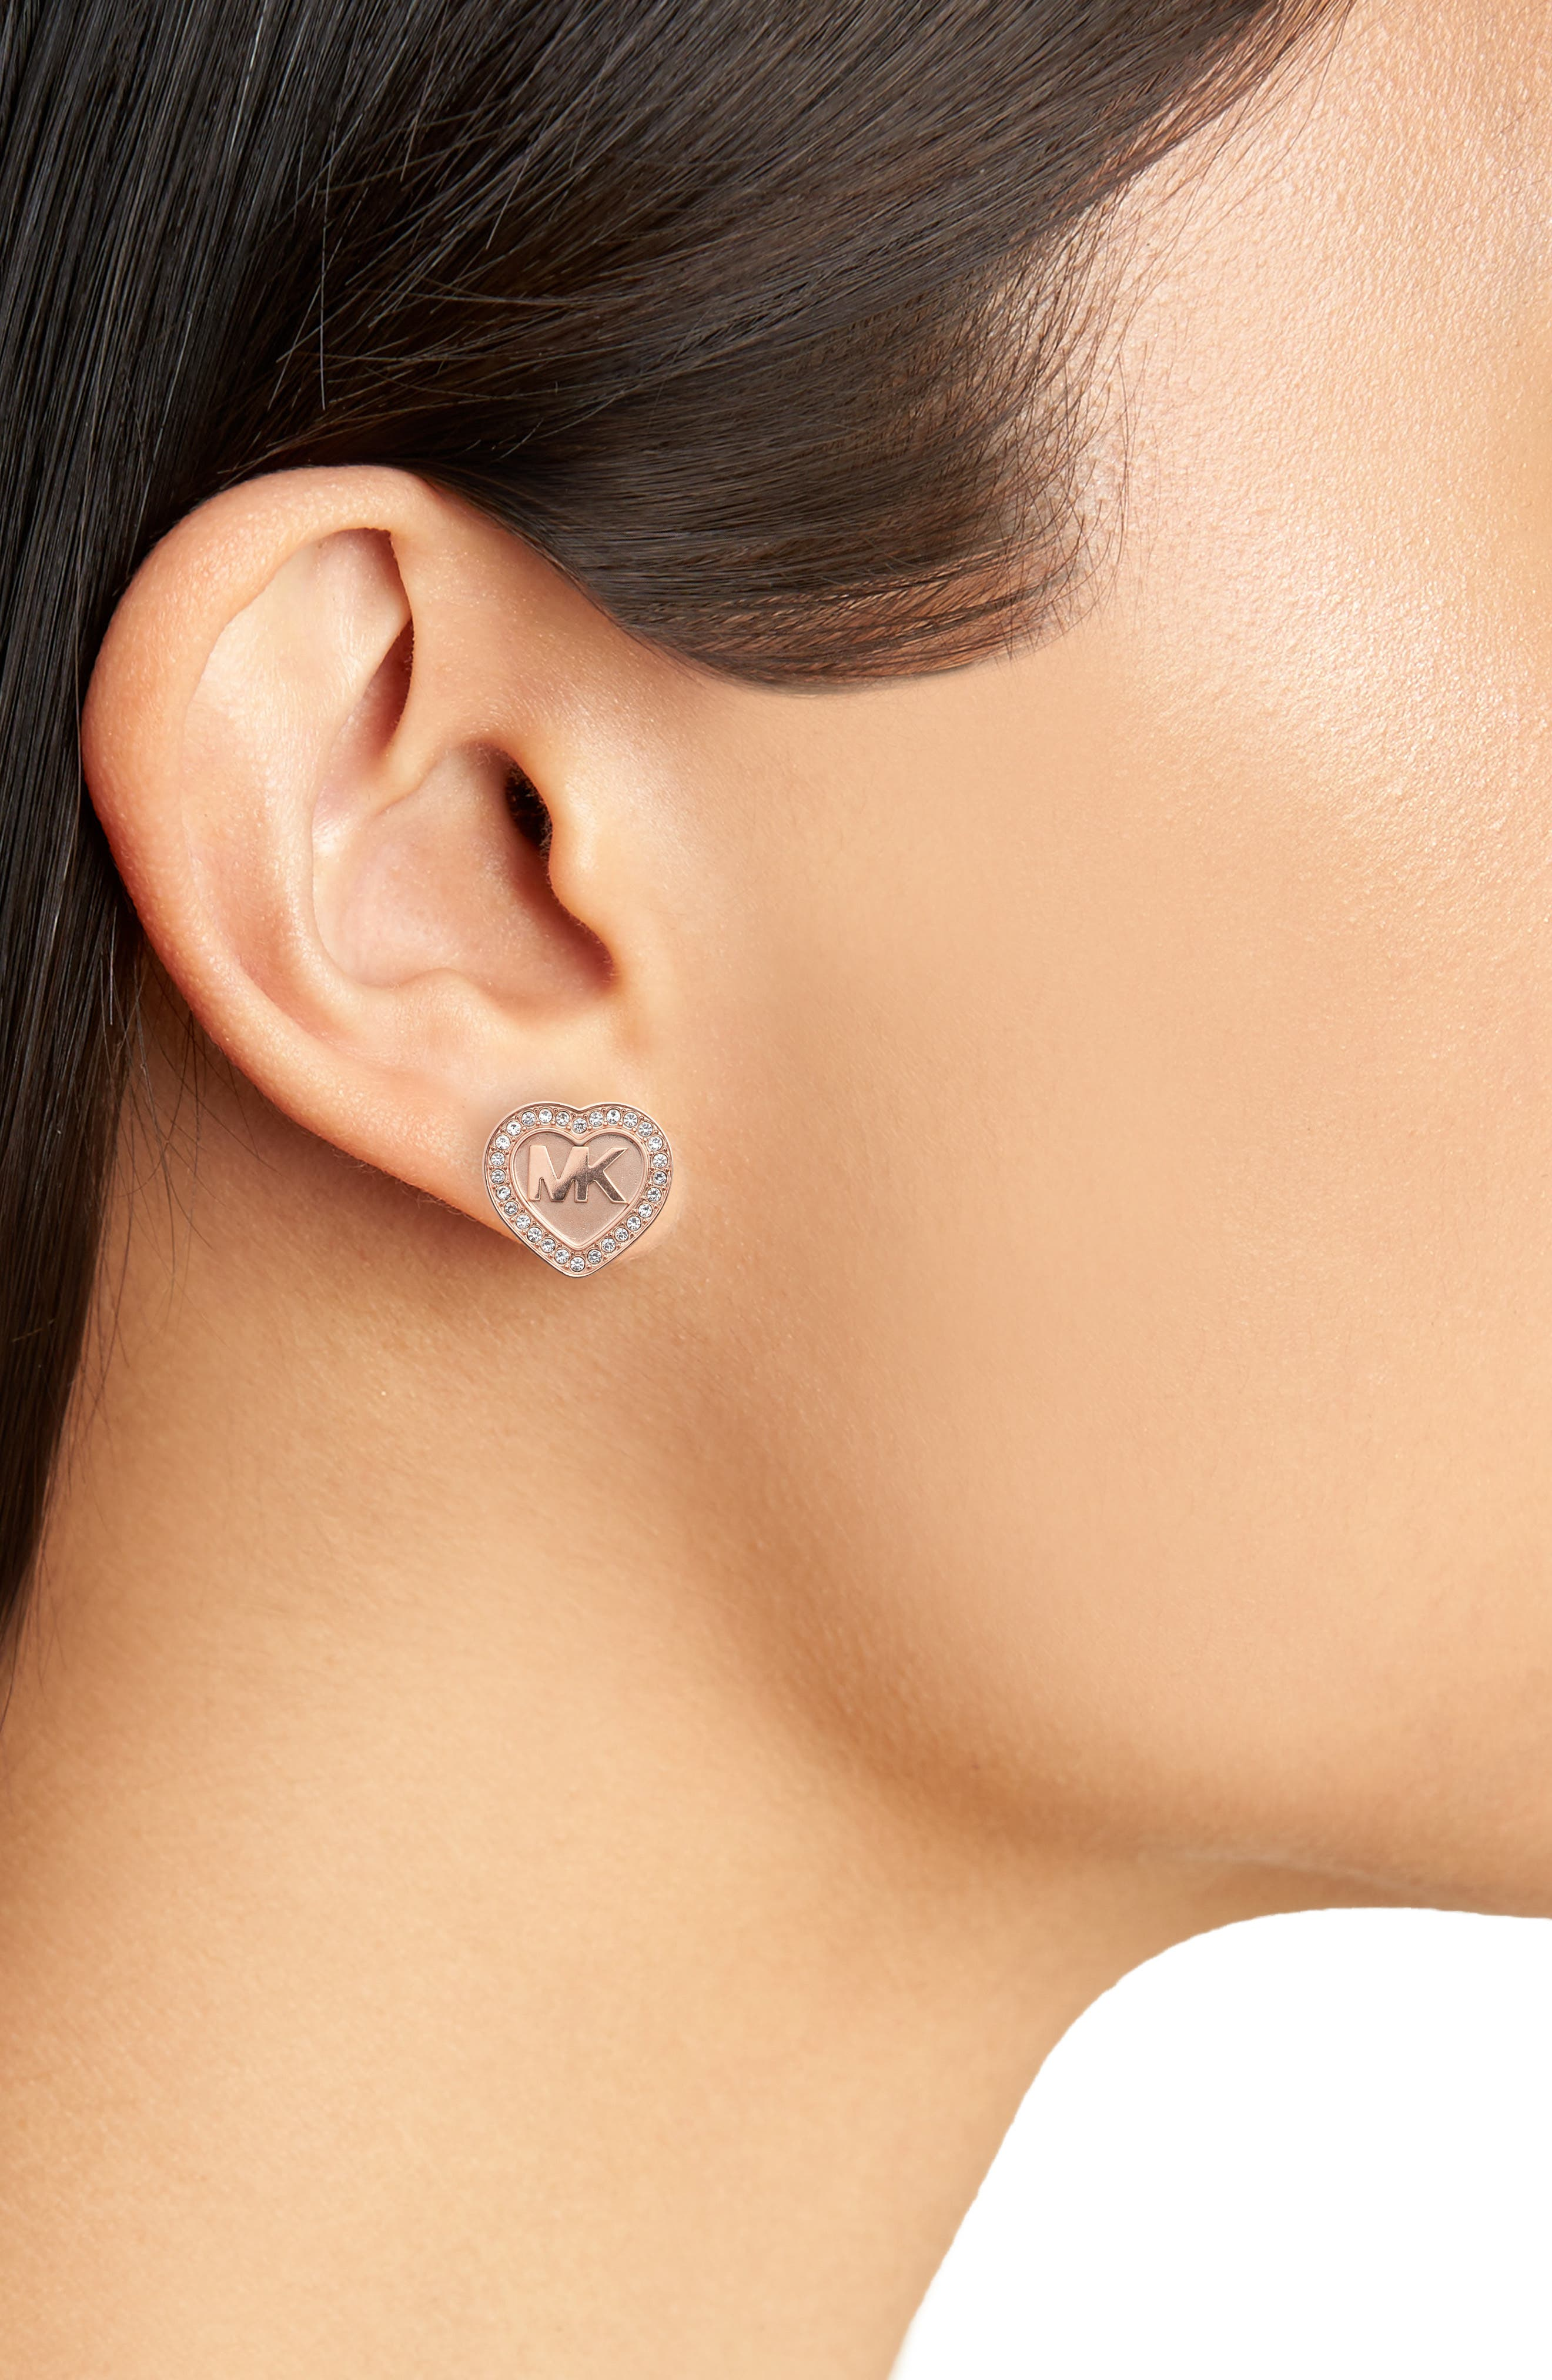 Heart Stud Earrings,                             Alternate thumbnail 2, color,                             650